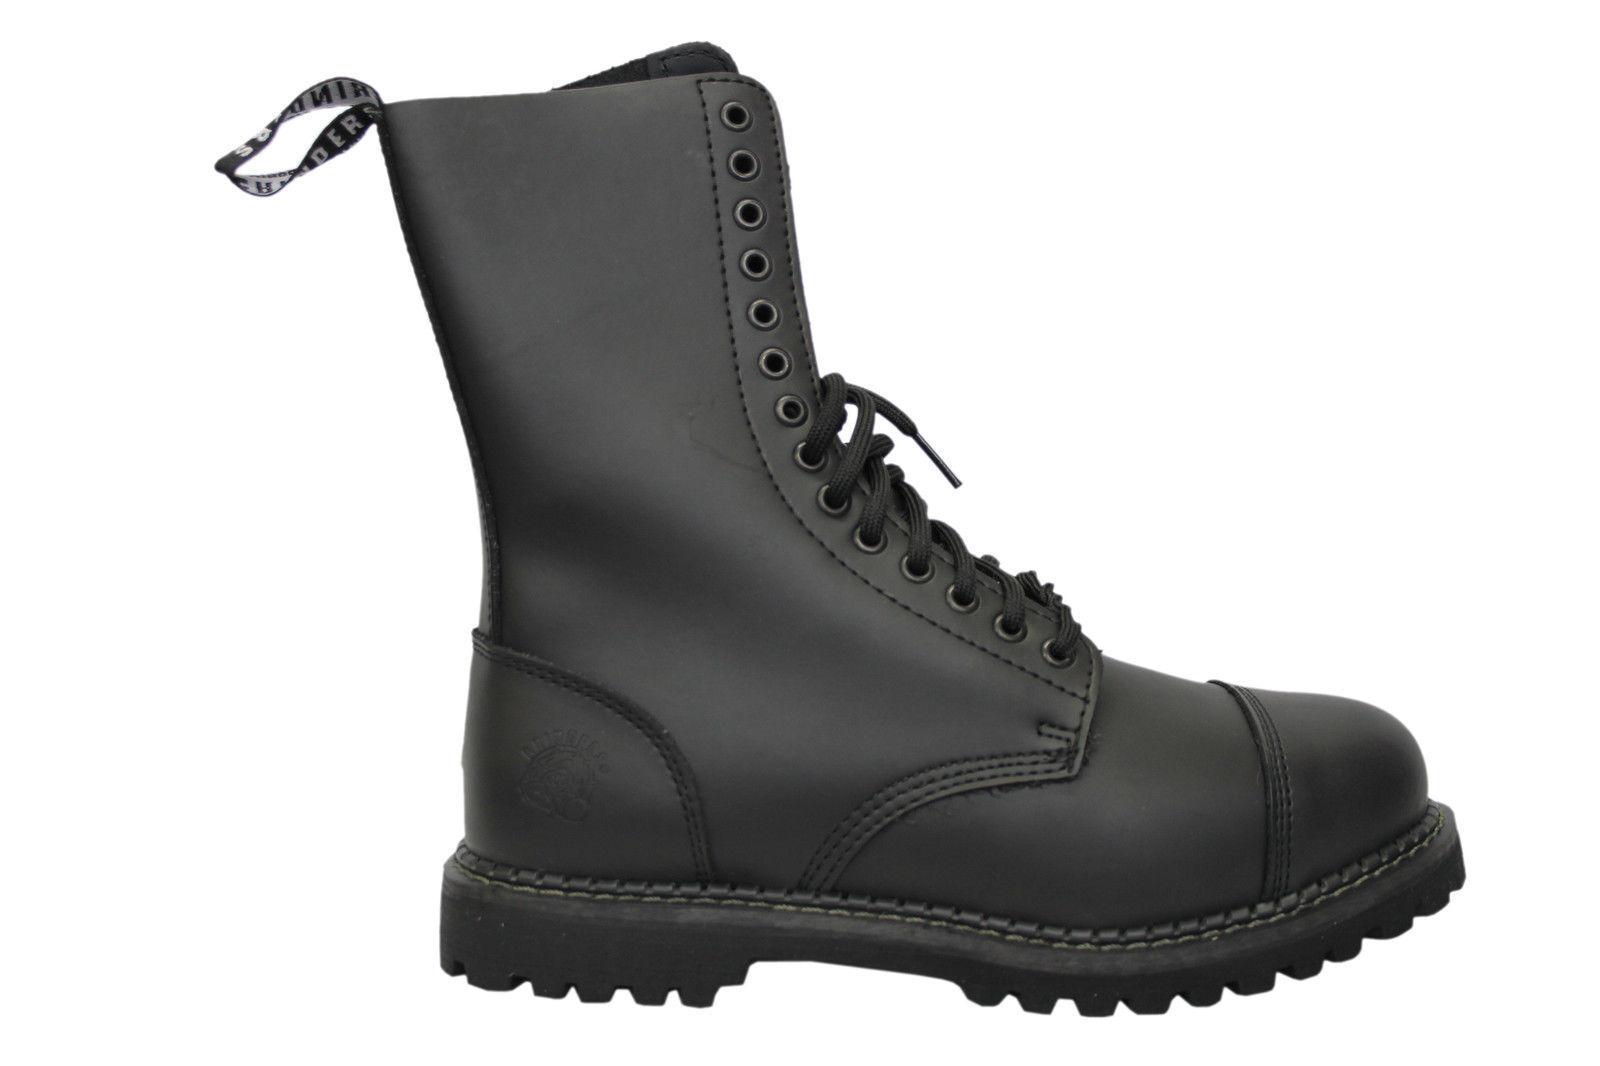 Grinders Herald CS Black 14 Hole Men's Ladies Safety Steel Toe Boots